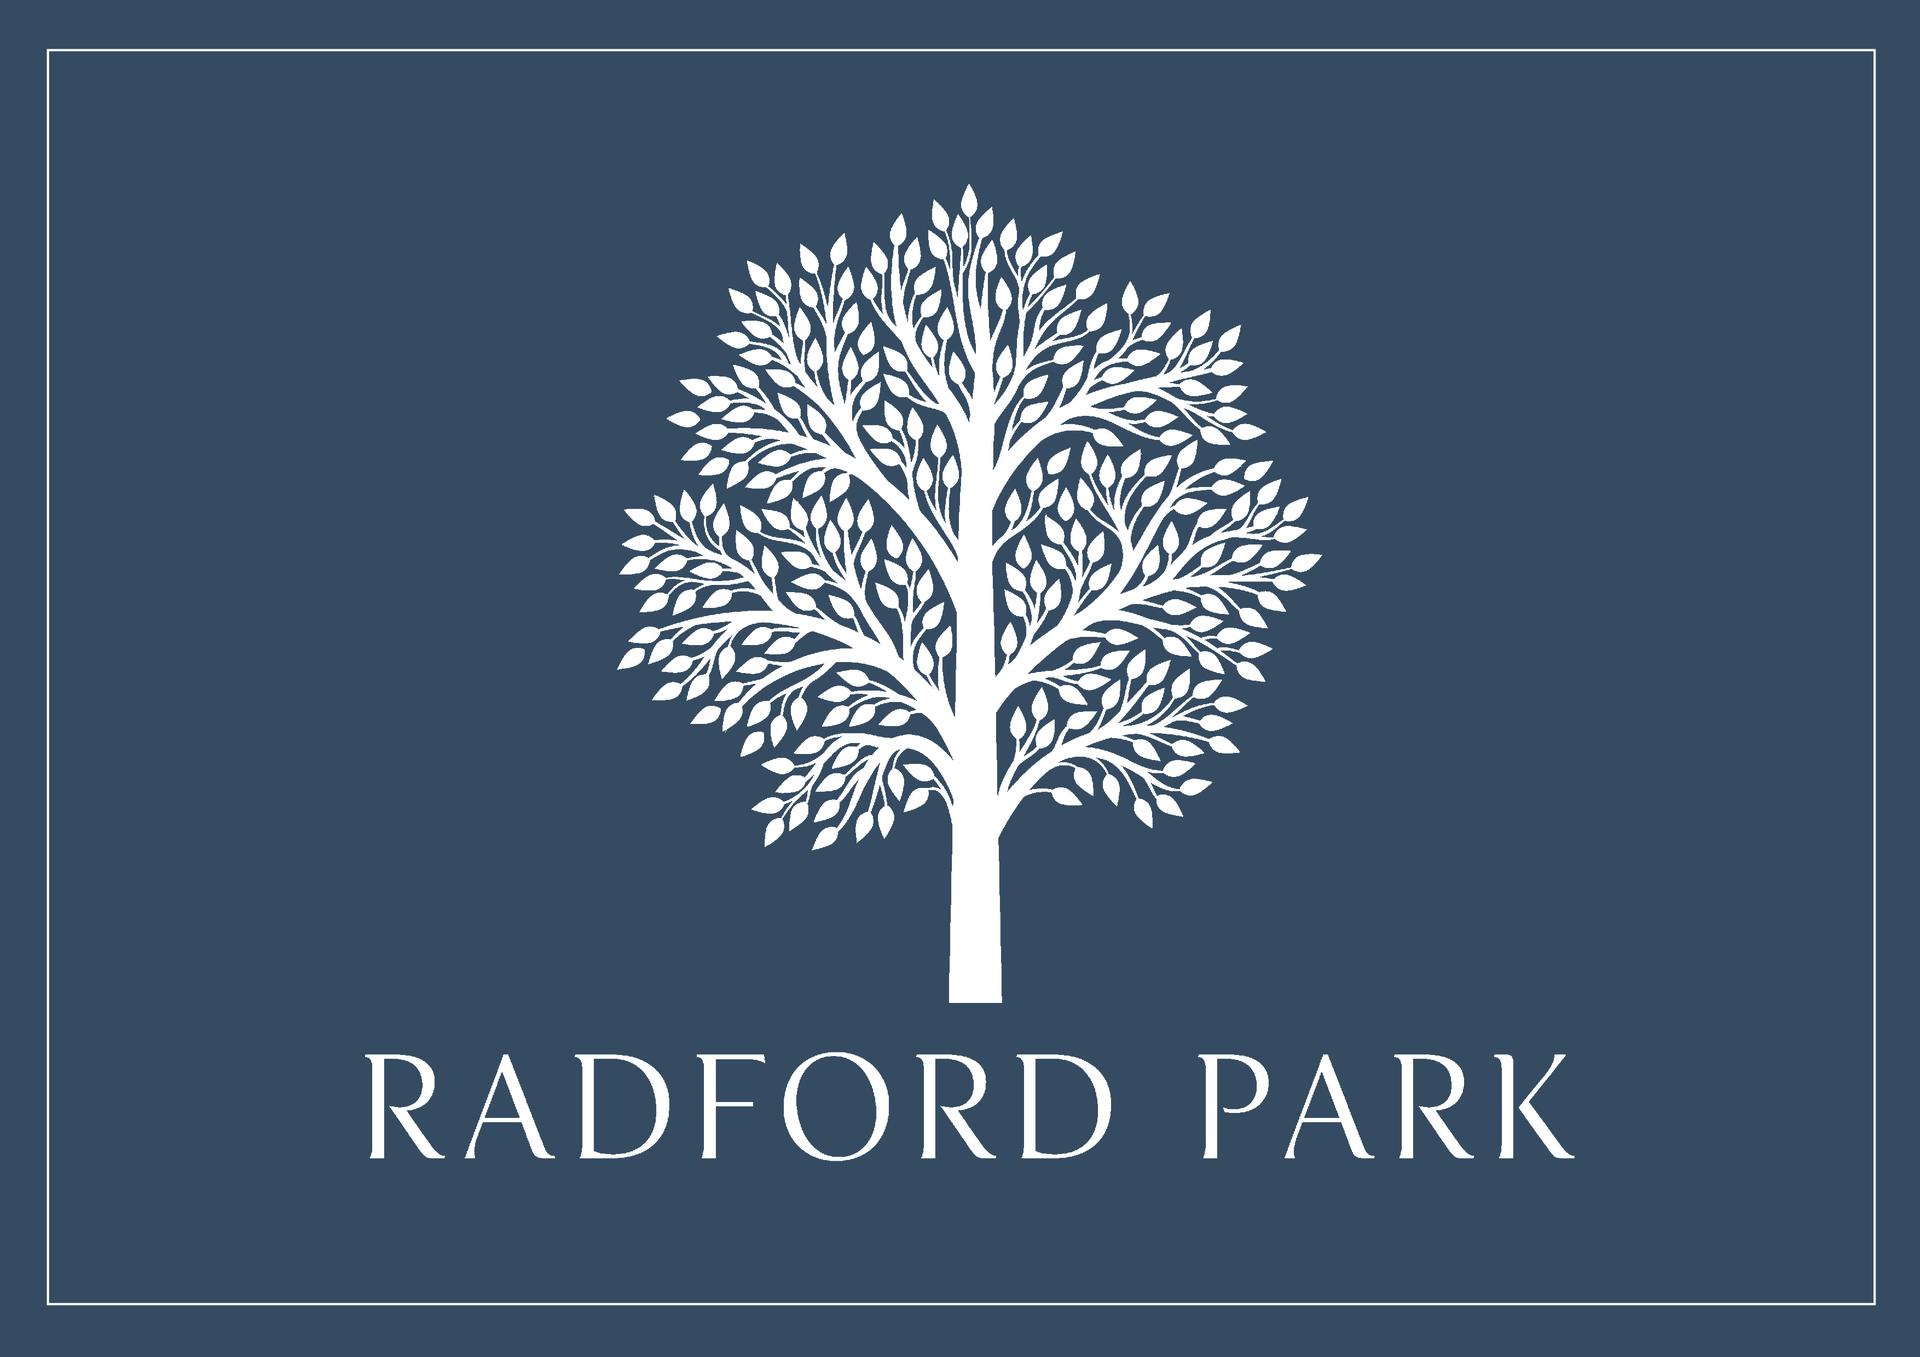 Branxton | Radford Park